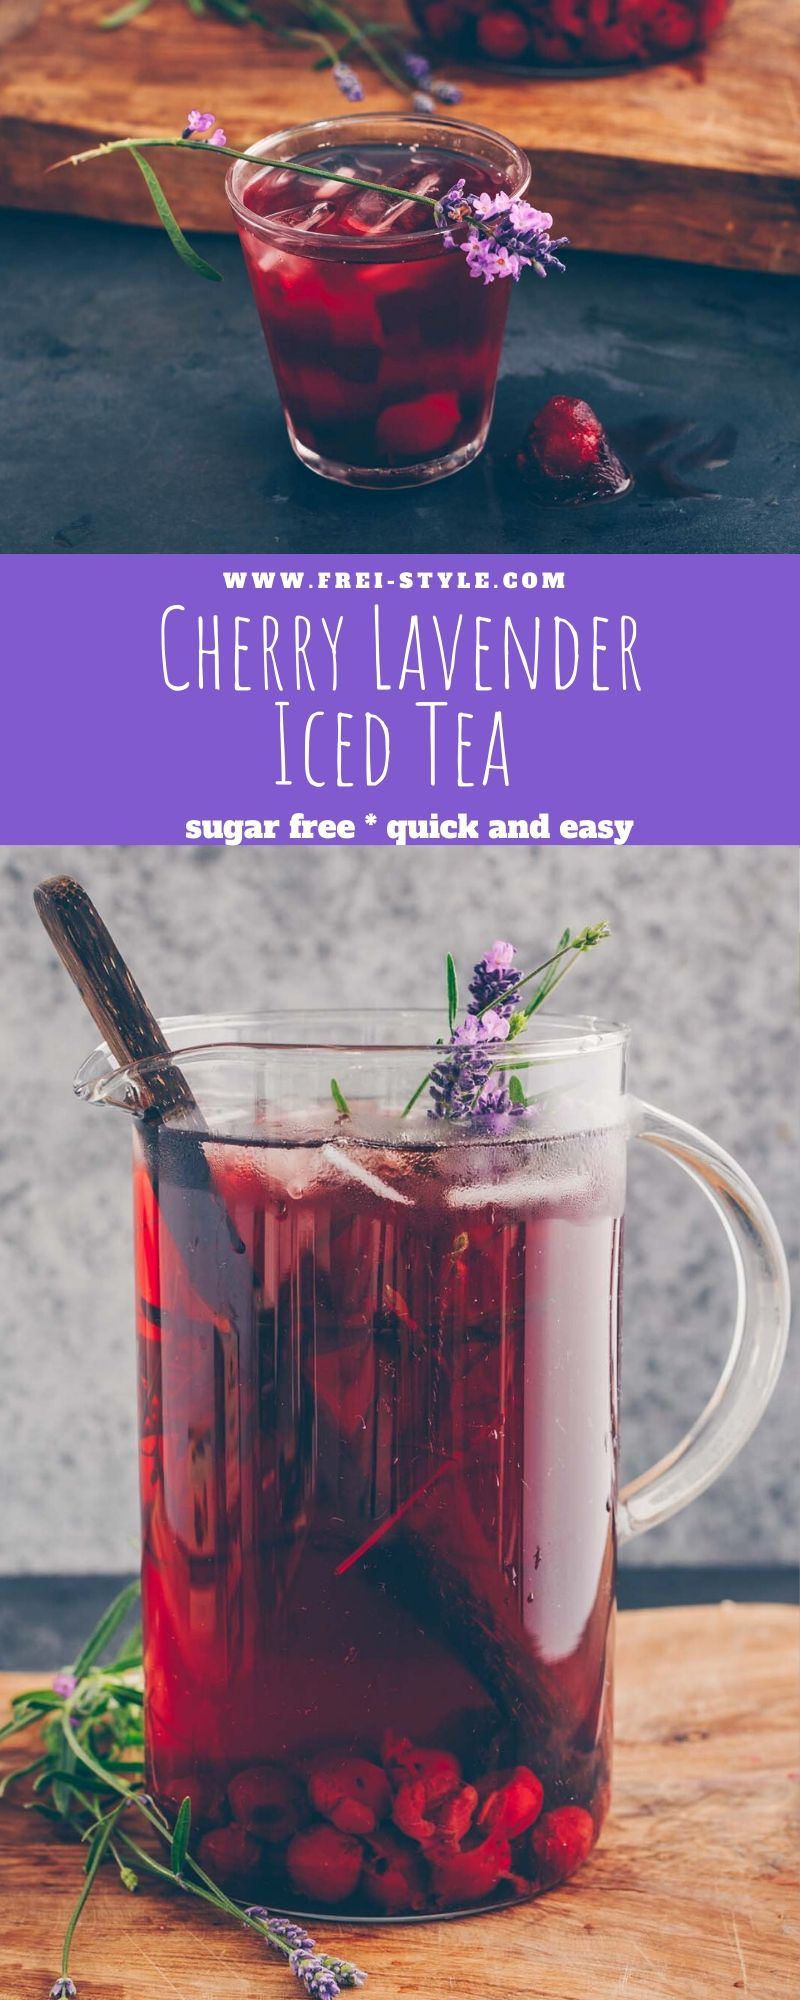 Cherry Lavender iced tea